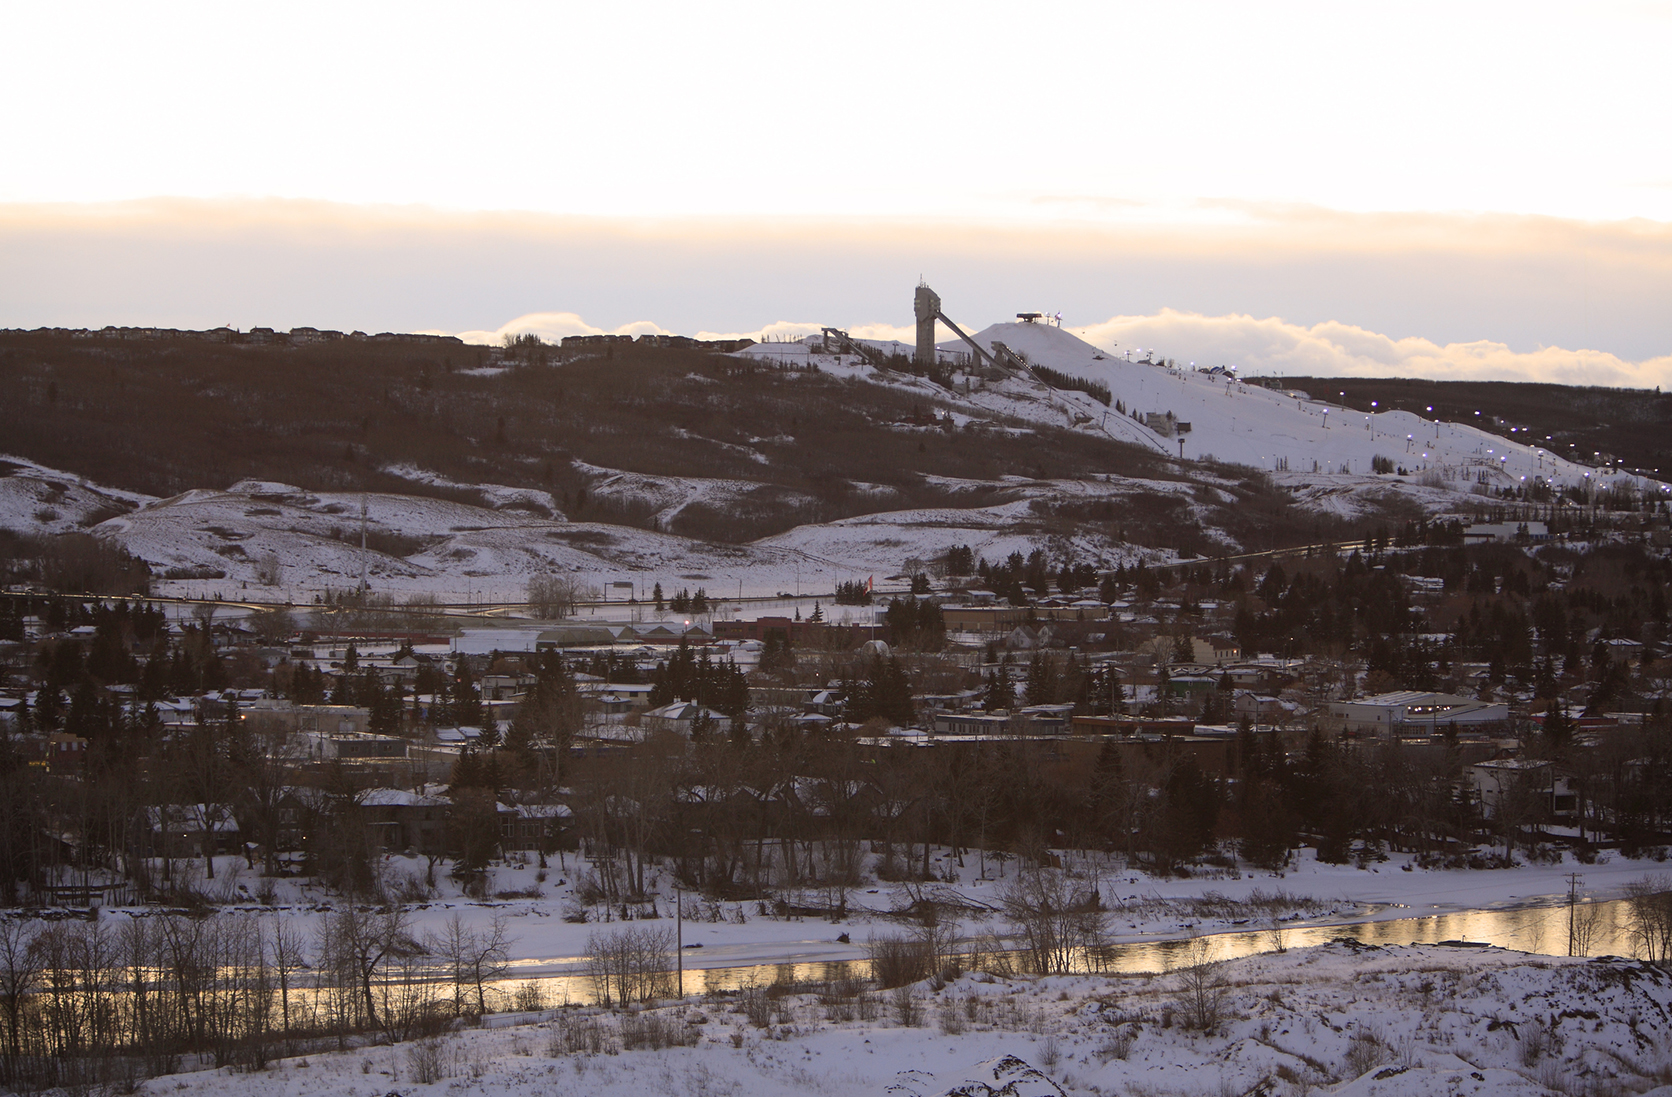 The ski jump at Calgary Olympic Park